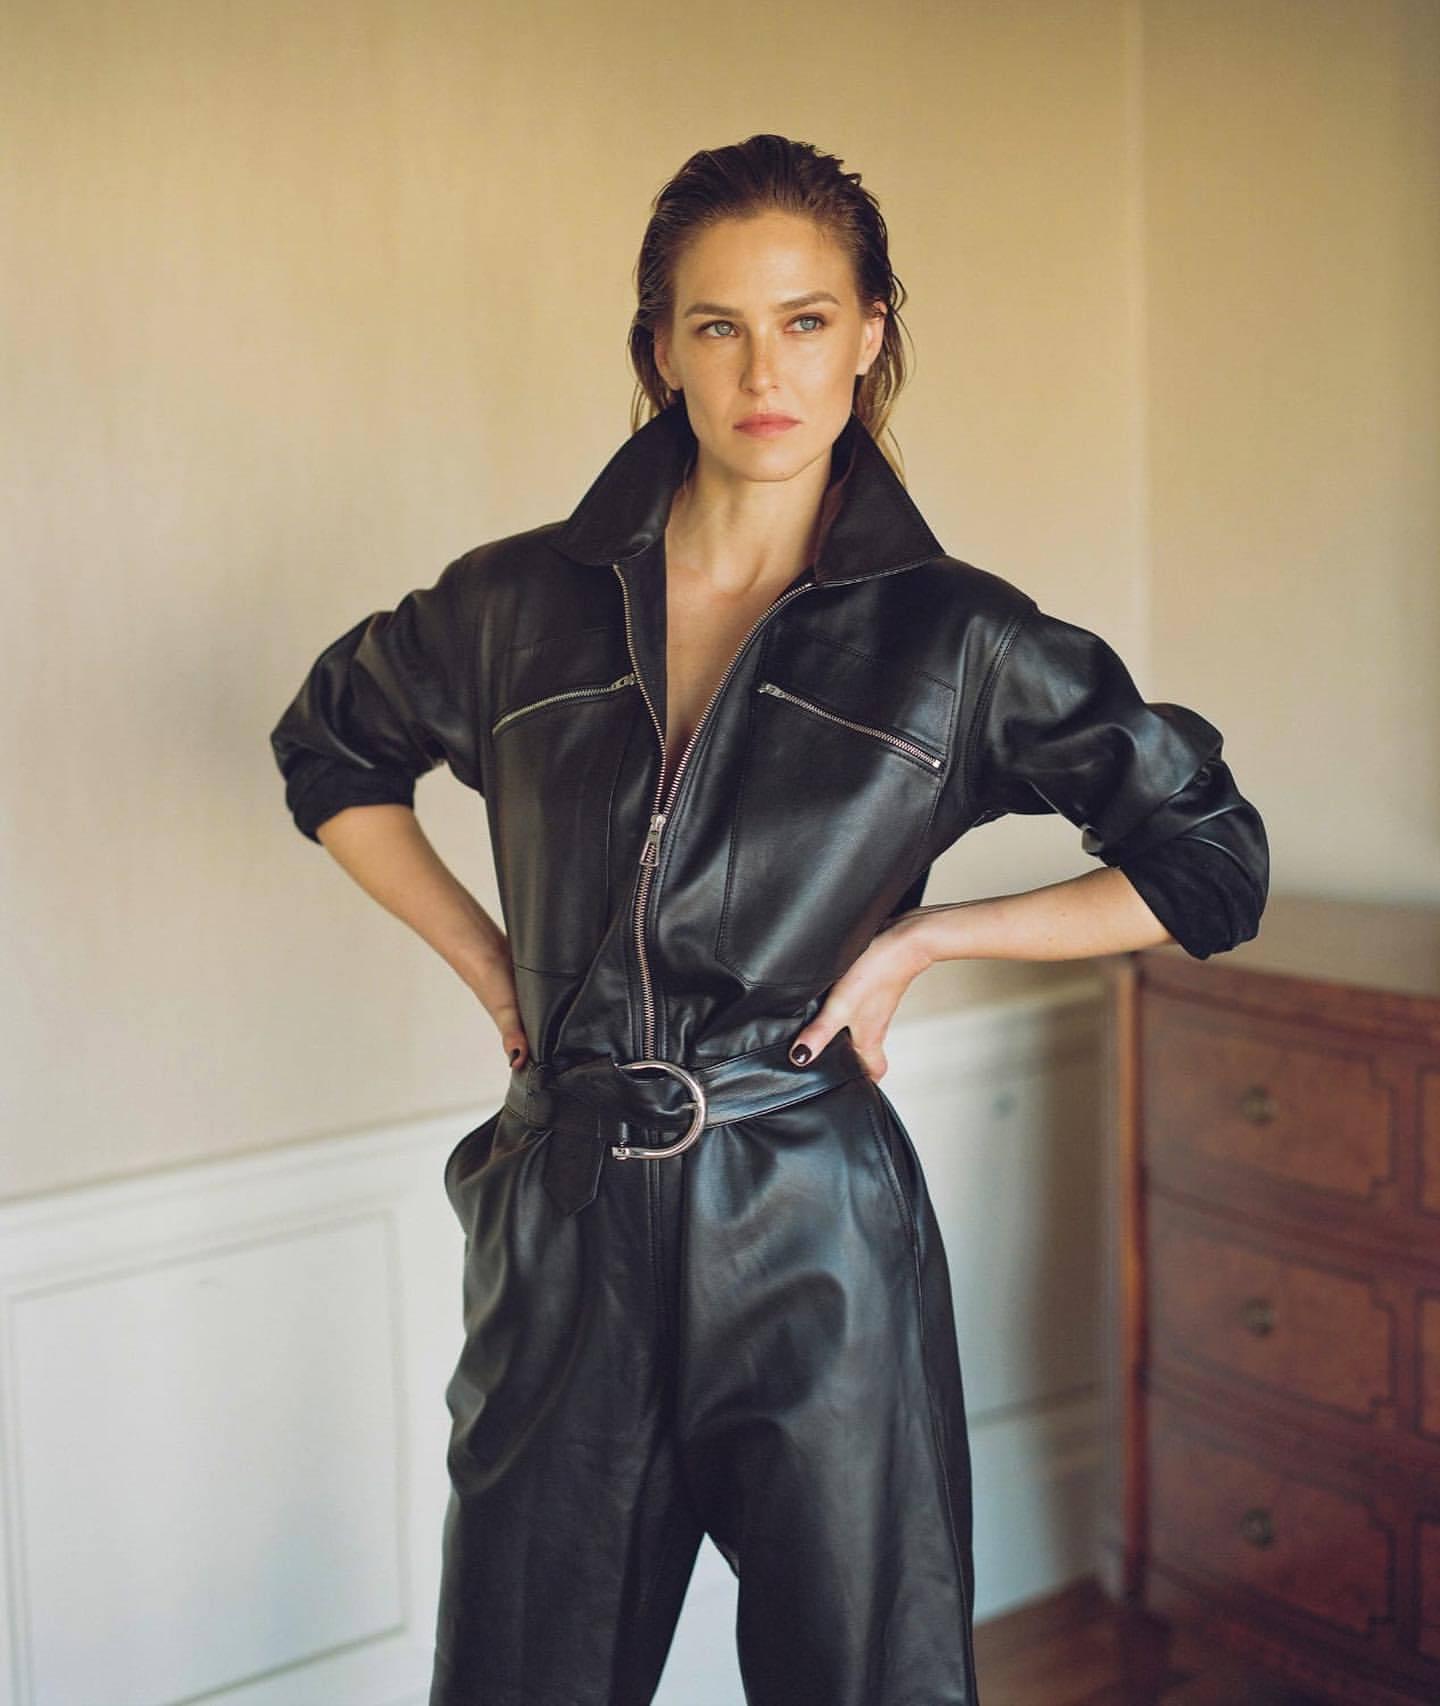 Bar Refaeli – Sexy Legs In Photoshoot For Dodo Bar Or Clothing Line 0018